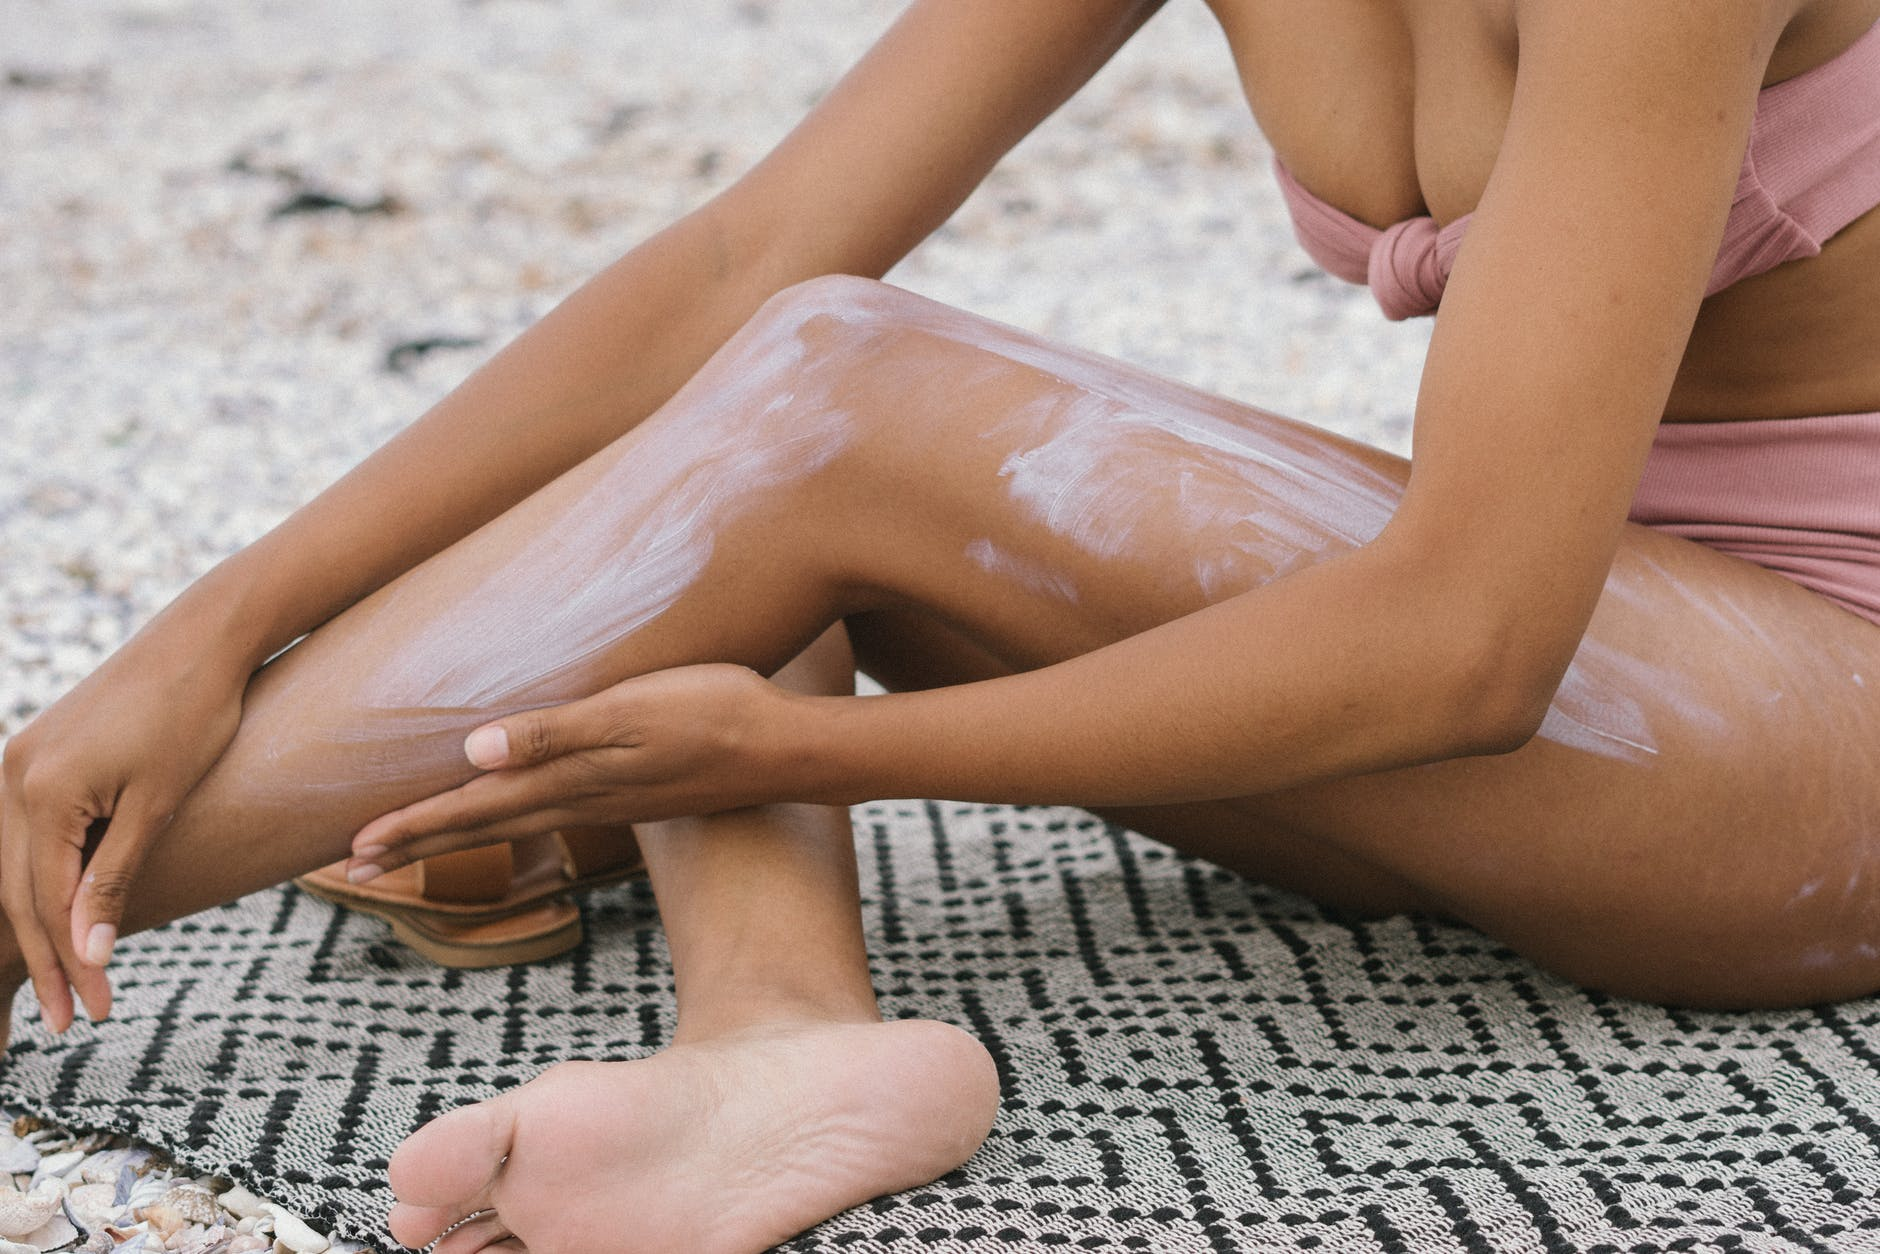 woman seated on textile applying suncsreen